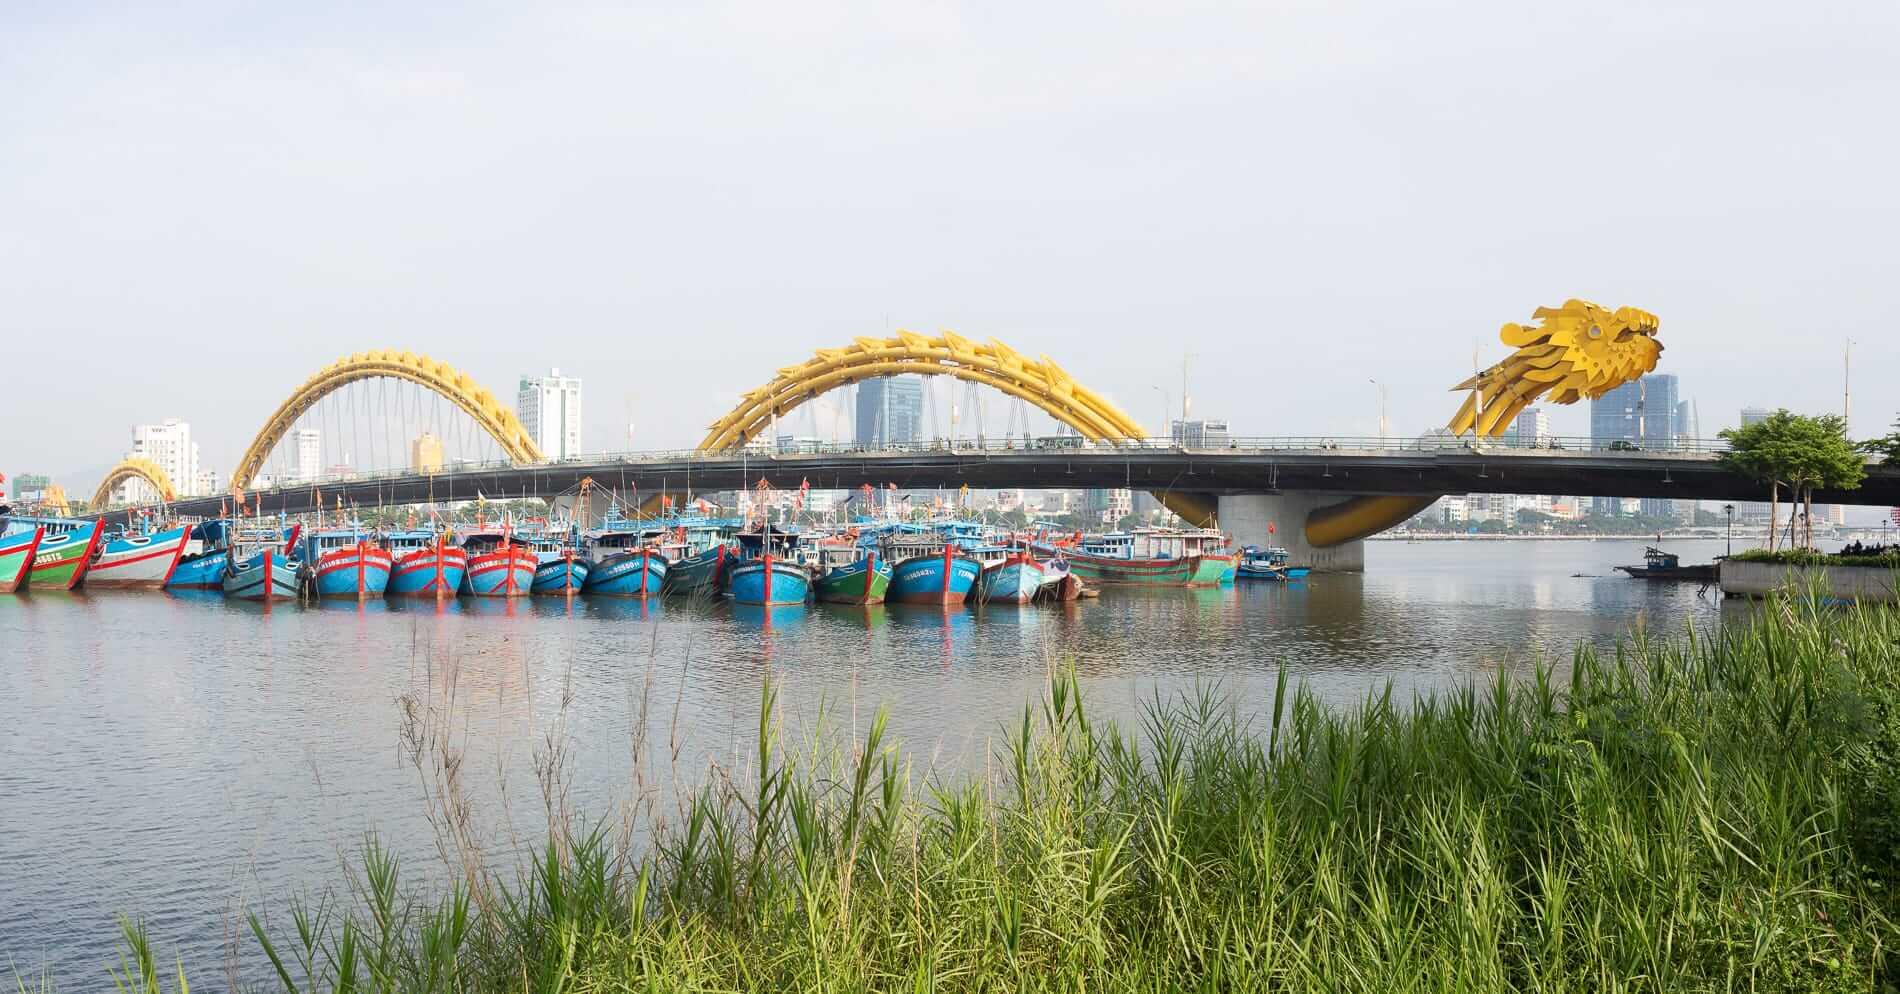 The Dragon Bridge and the beach